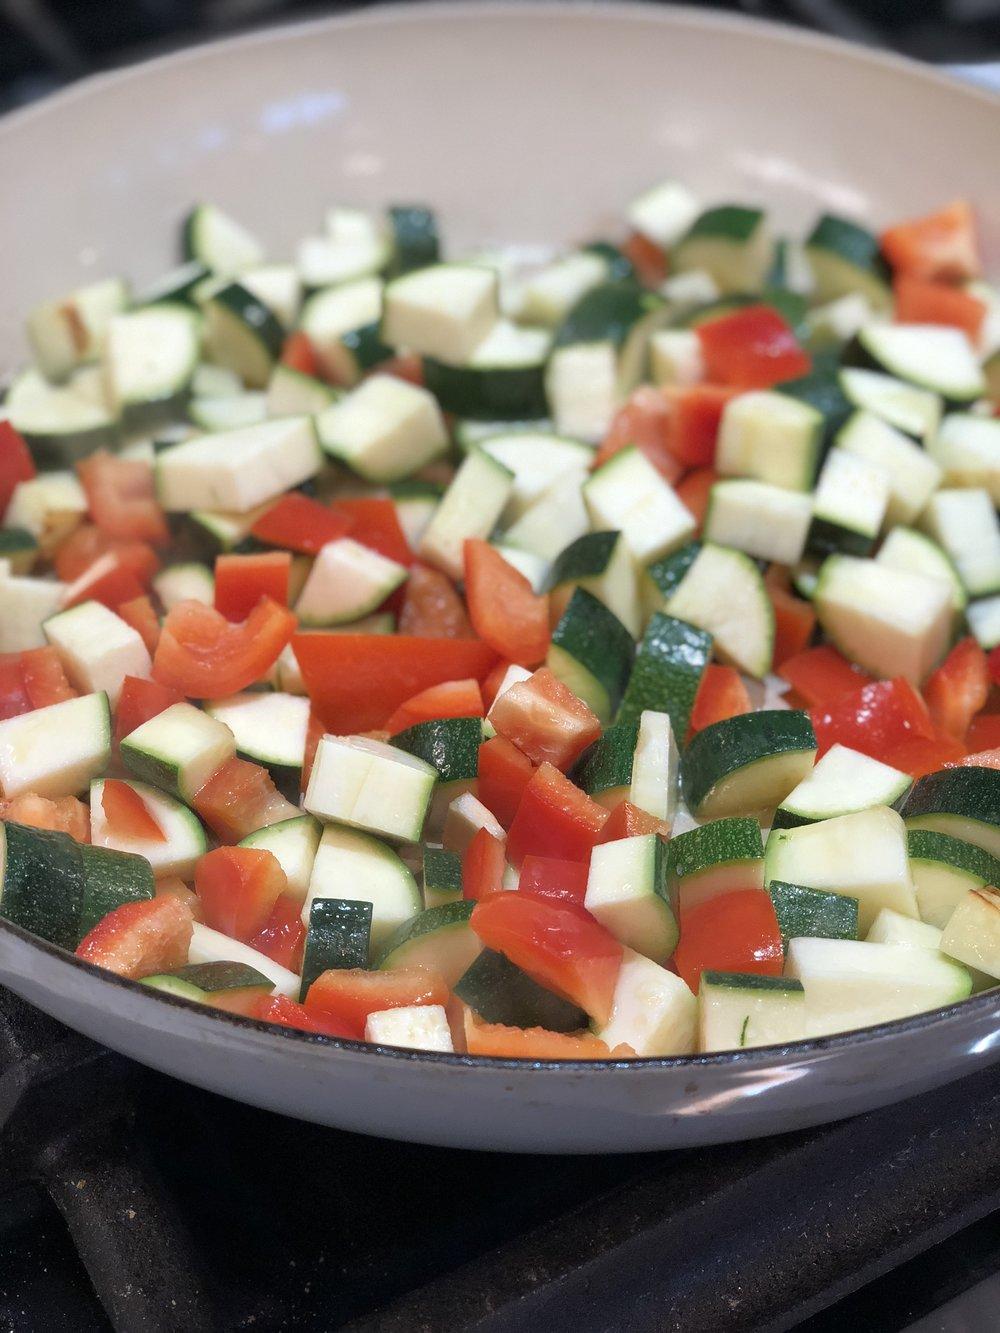 almonds and asana saute zuchinni and pepper.jpg